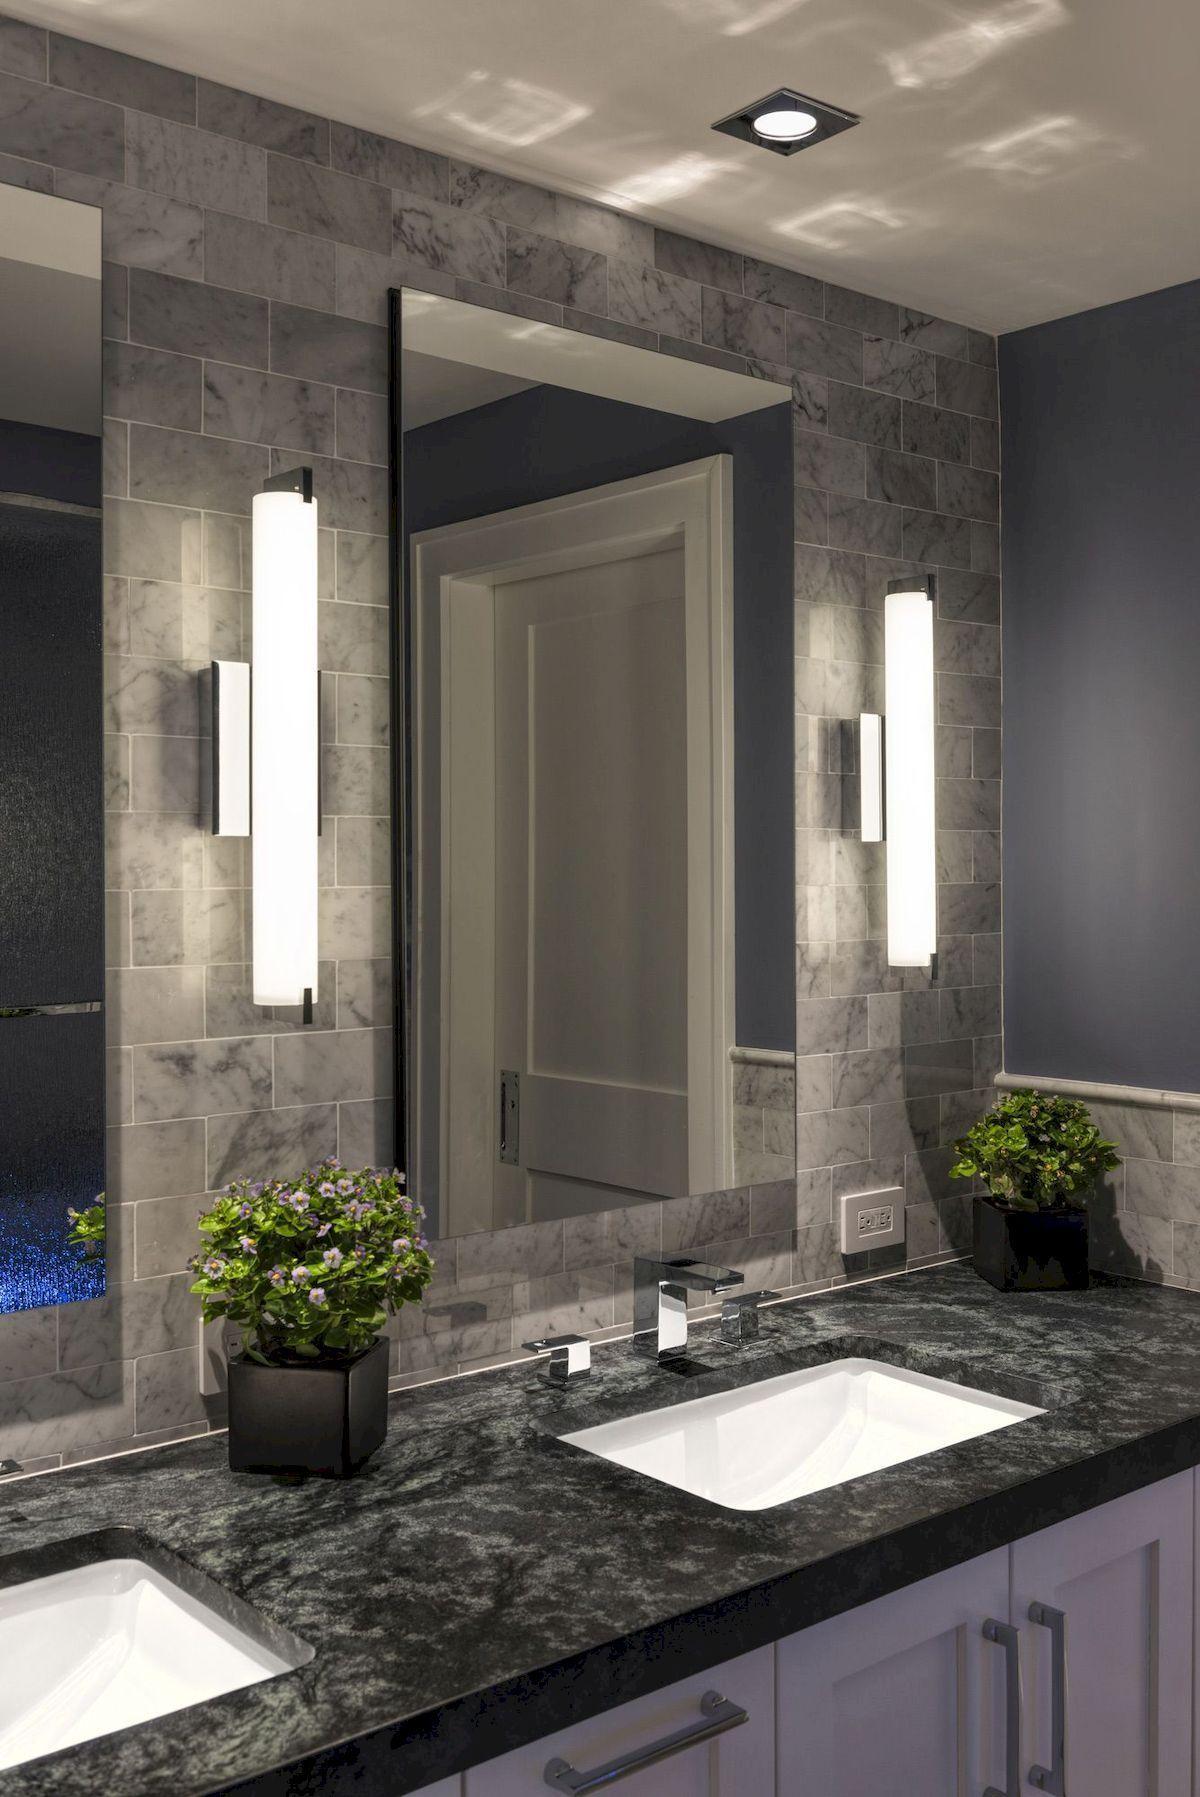 Bathroom Lighting Ideas Jihanshanum Best Bathroom Lighting Amazing Bathrooms Bathroom Mirror Design